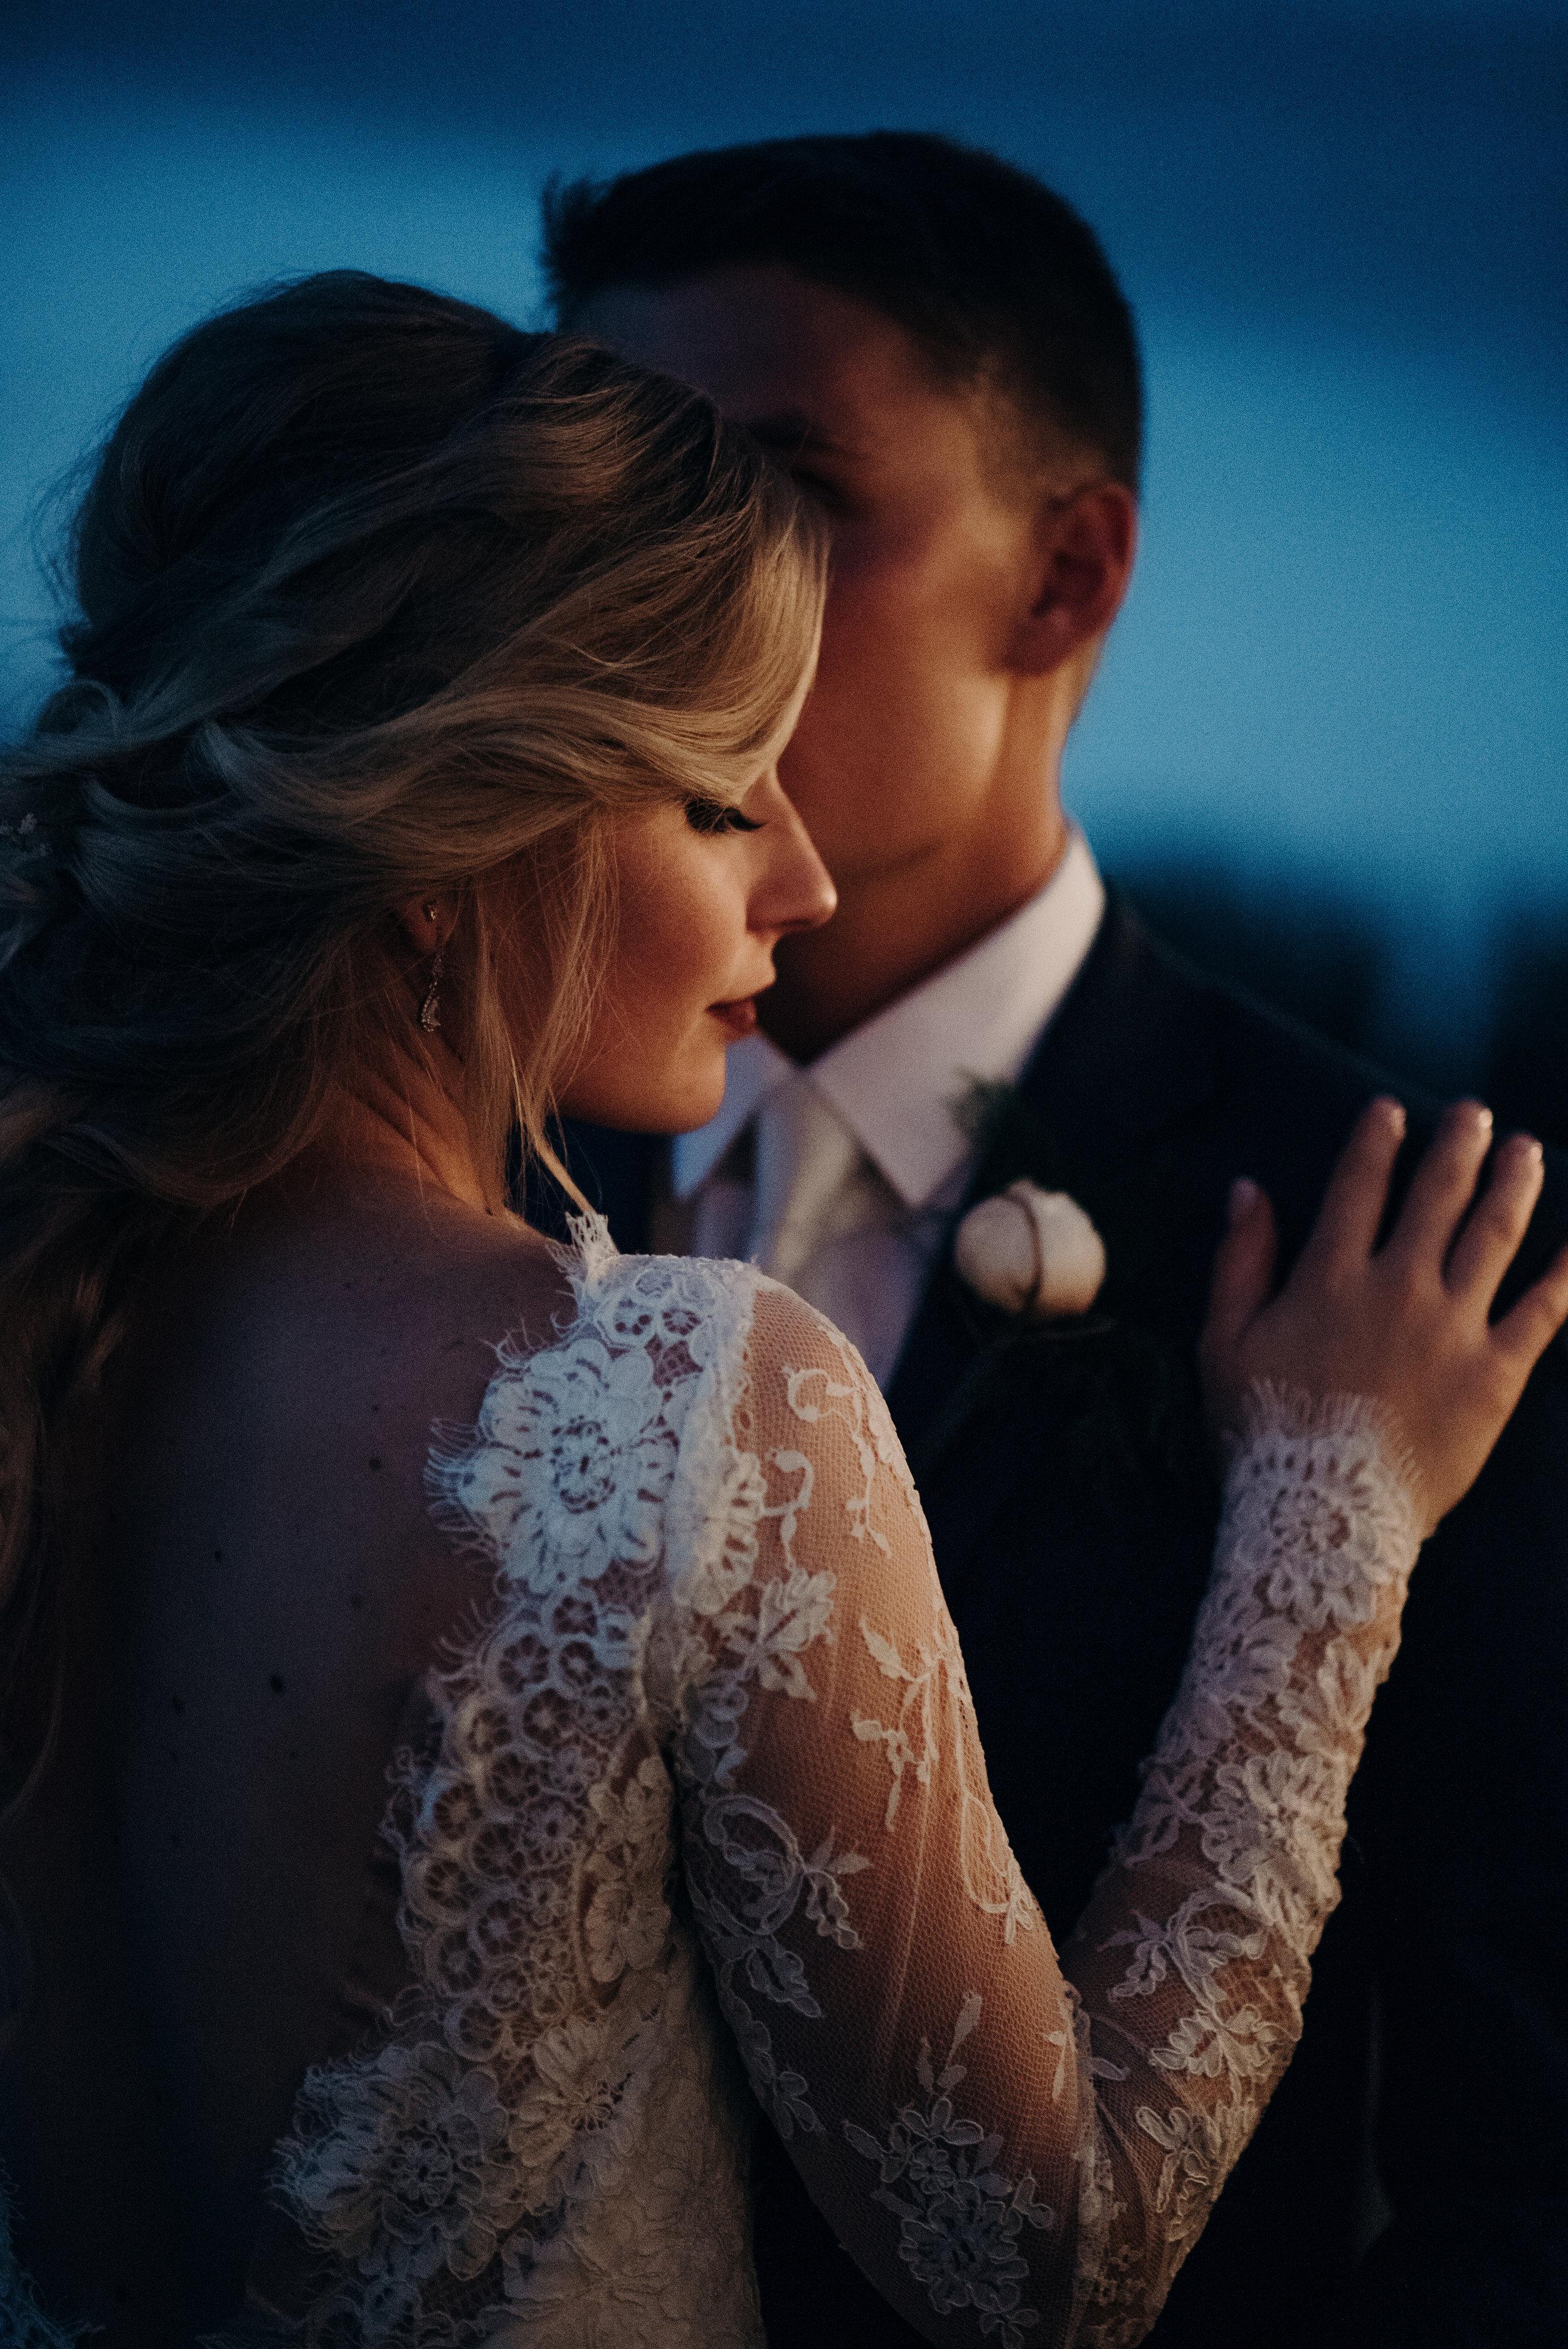 micayla-greyson-neumann-vero-beach-lake-house-winter-white-wedding-photography-1143.jpg